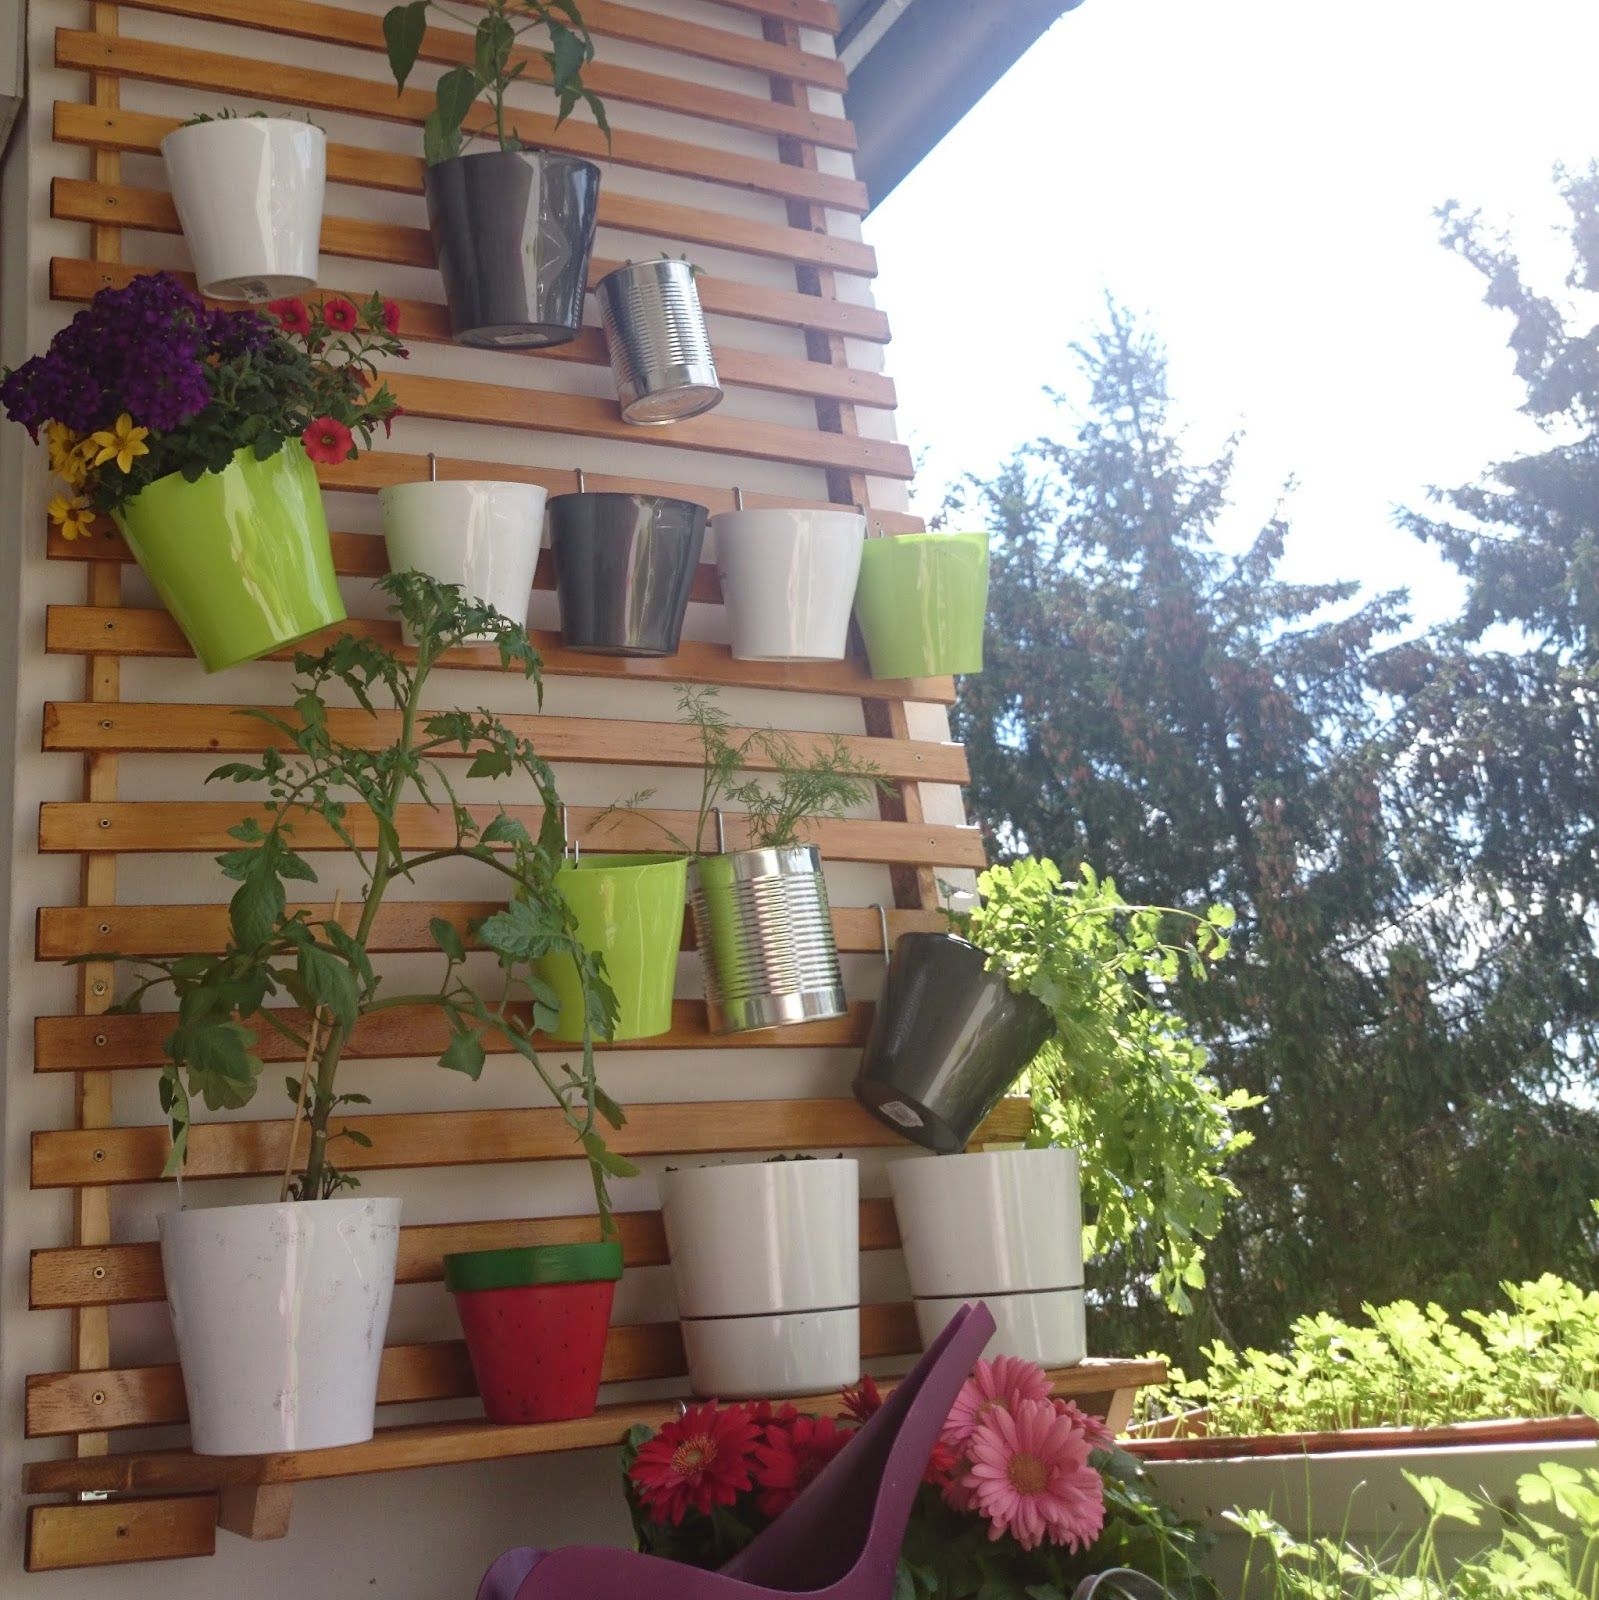 Mini Balkon diy balkonien pflanzen auf mini balkon mit hilfe eines